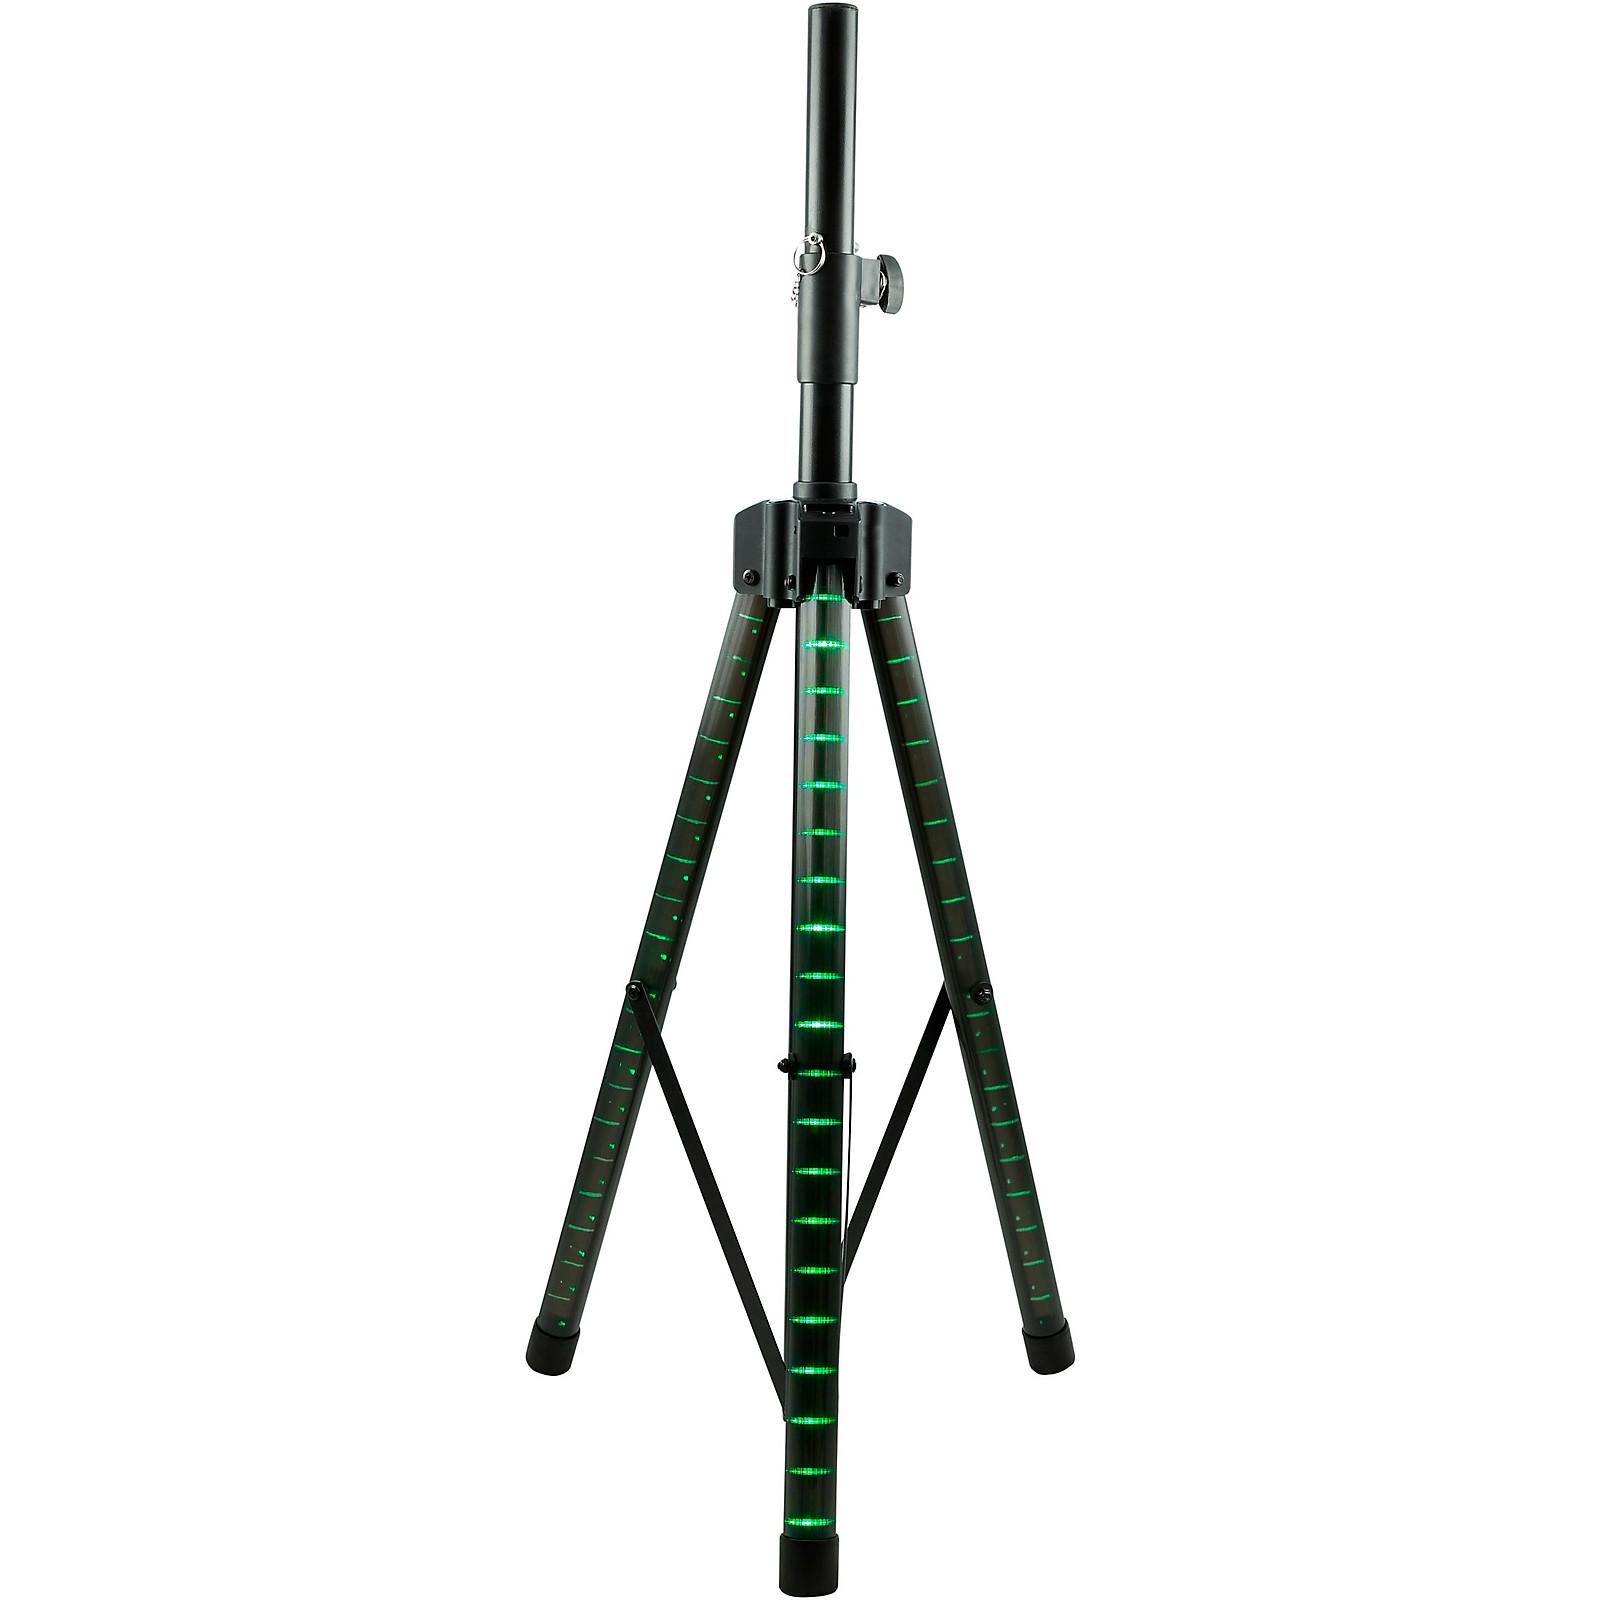 Gemini Lighted Tripod Stand